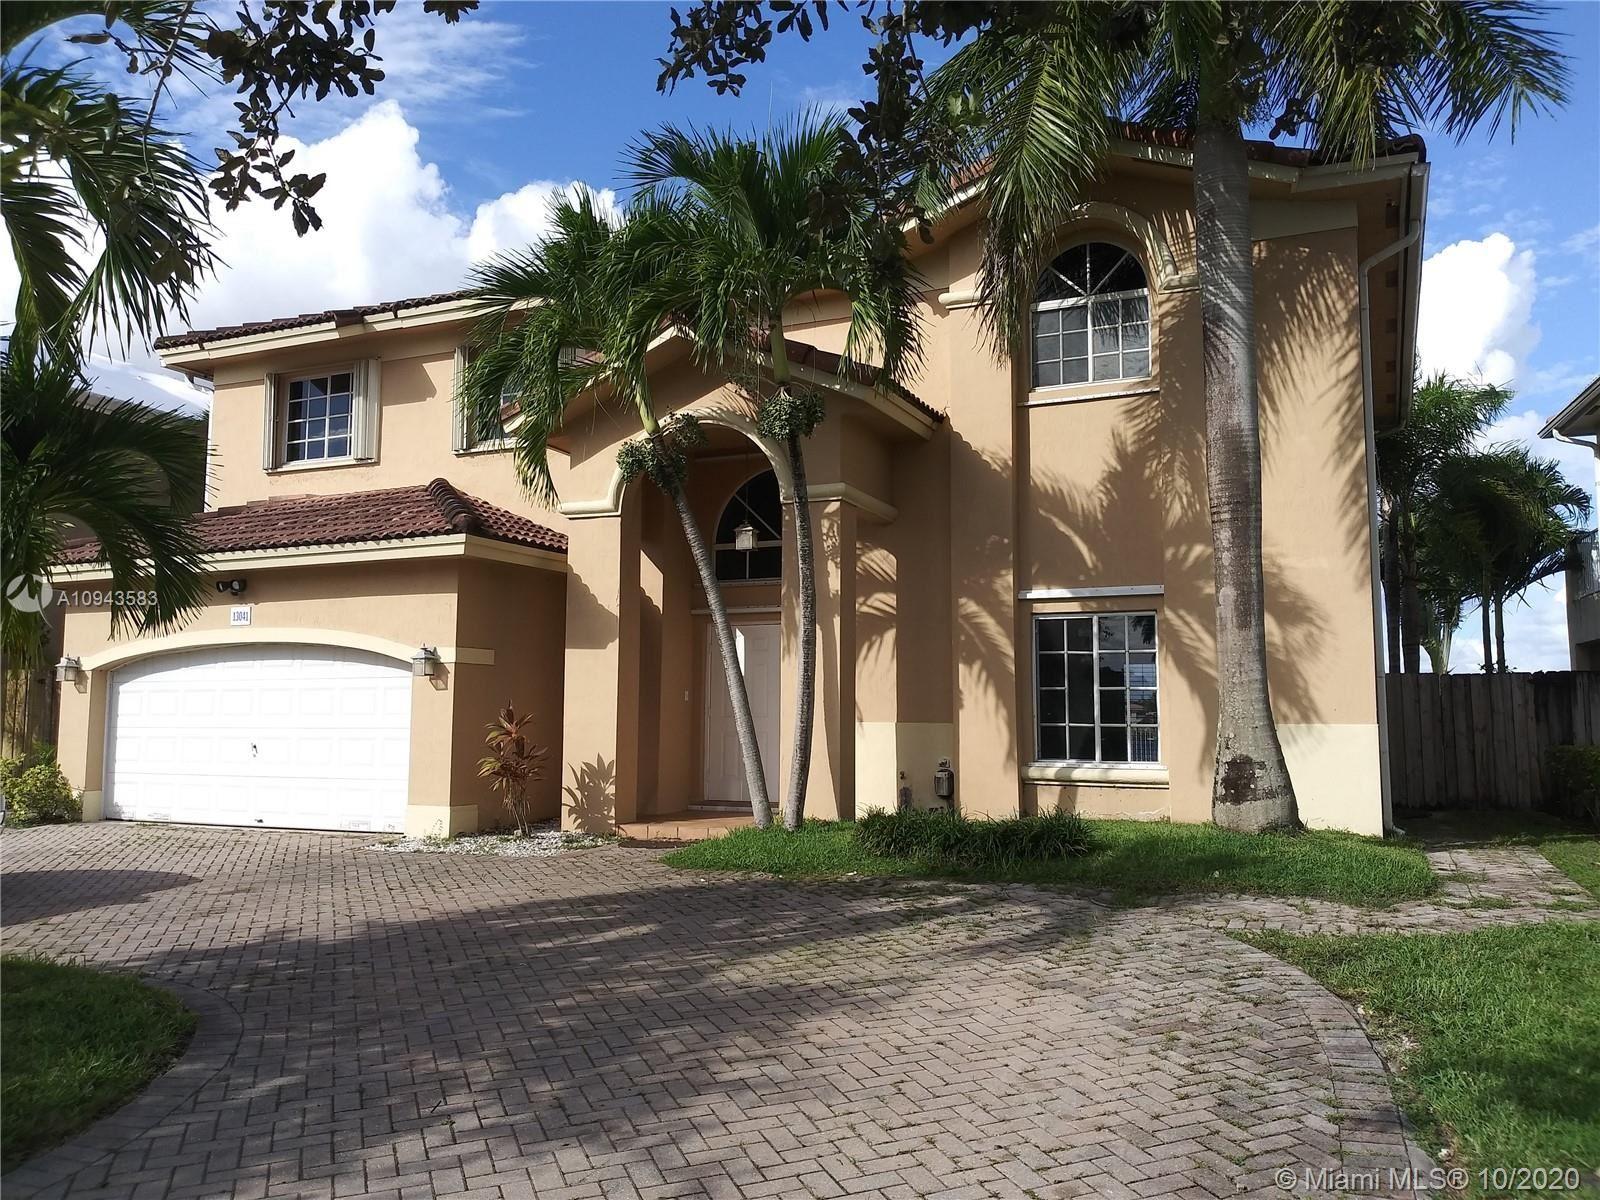 13041 SW 140th St Rd, Miami, FL 33186 - #: A10943583